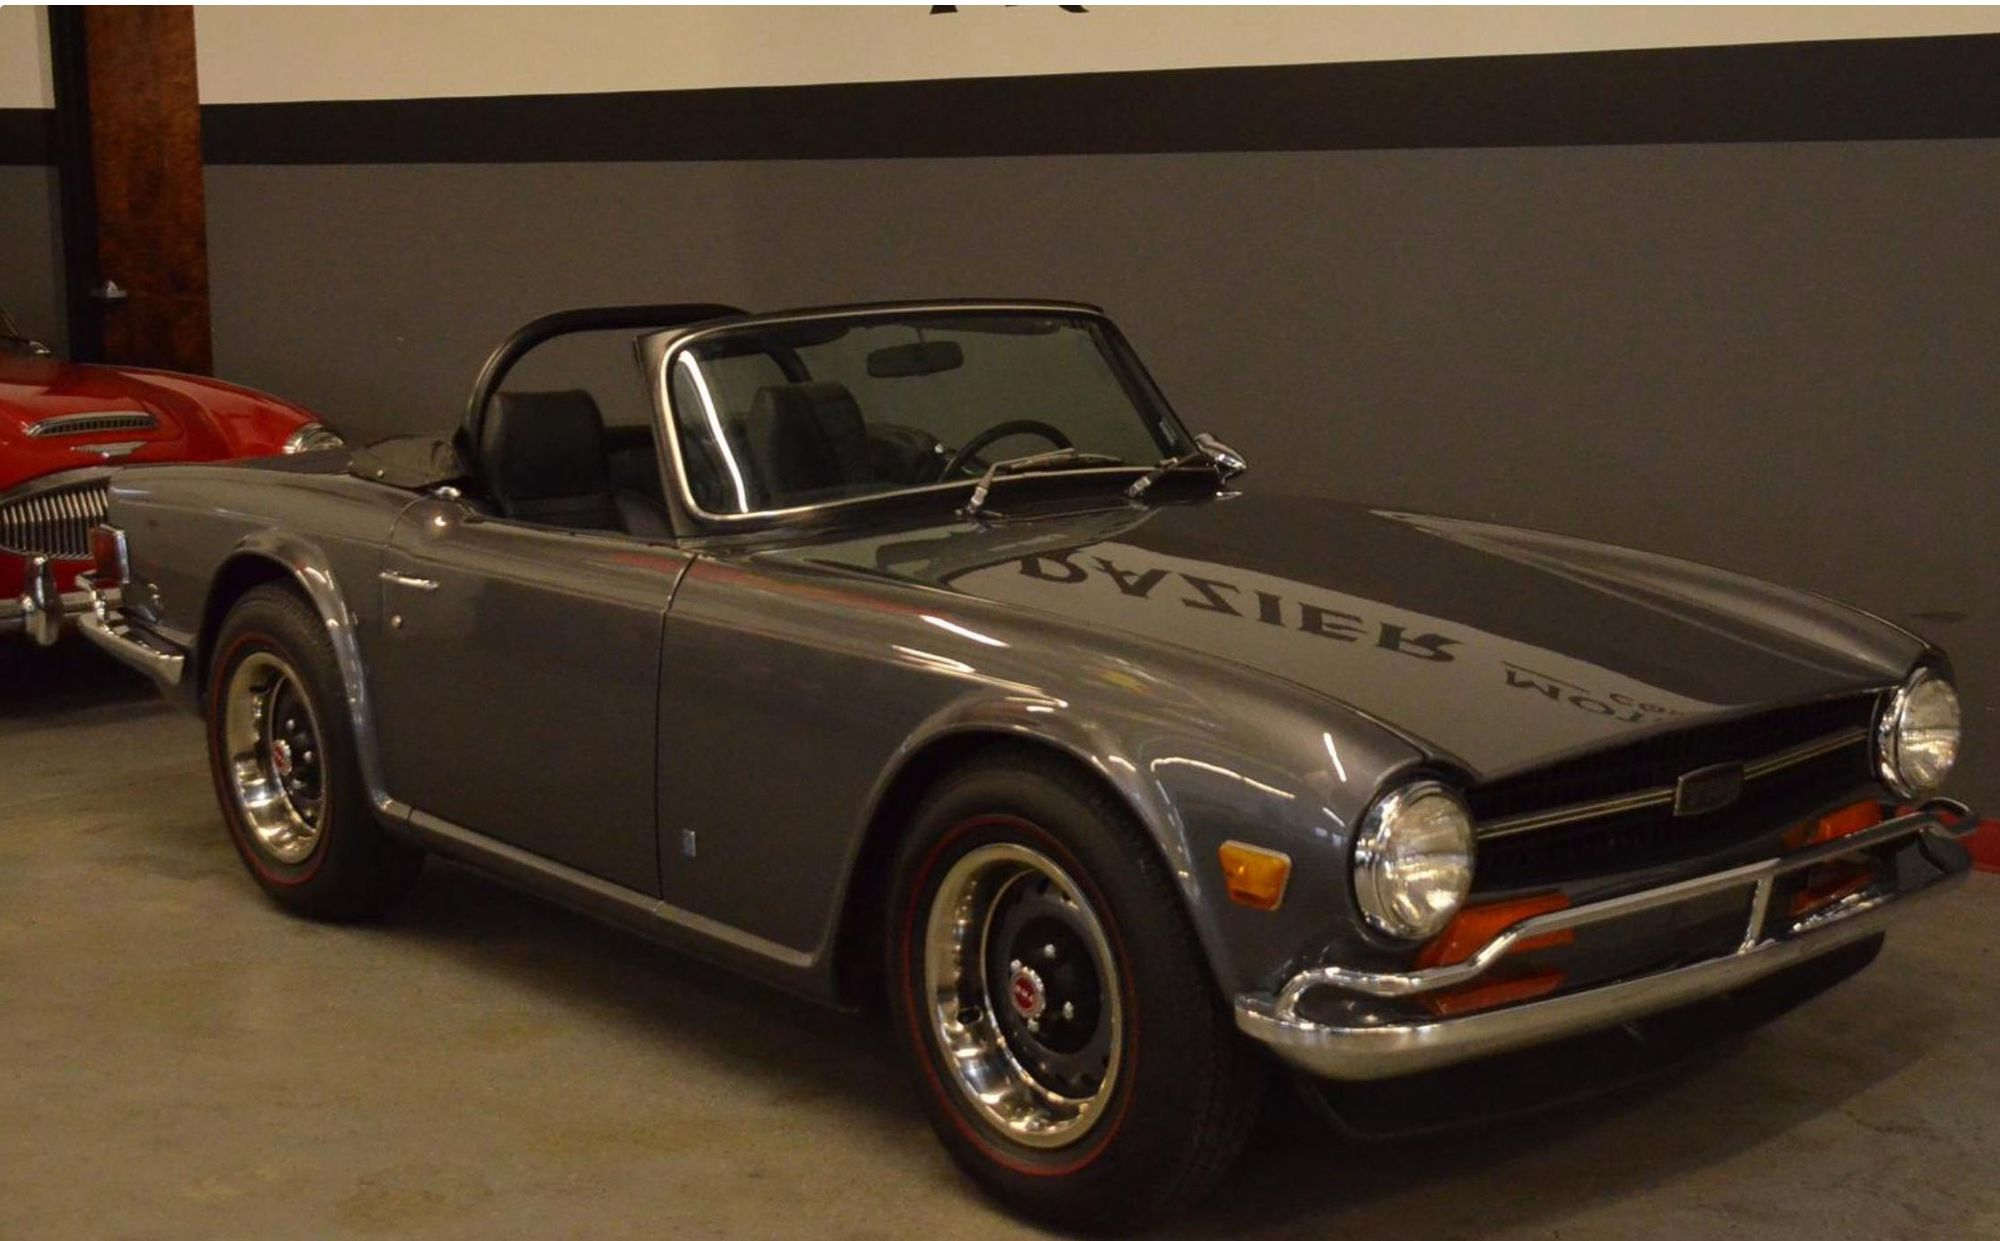 "<img src=""1971-triumph-tr6.jpg"" alt=""The front three quarters of a 1971 Triumph TR6"">"